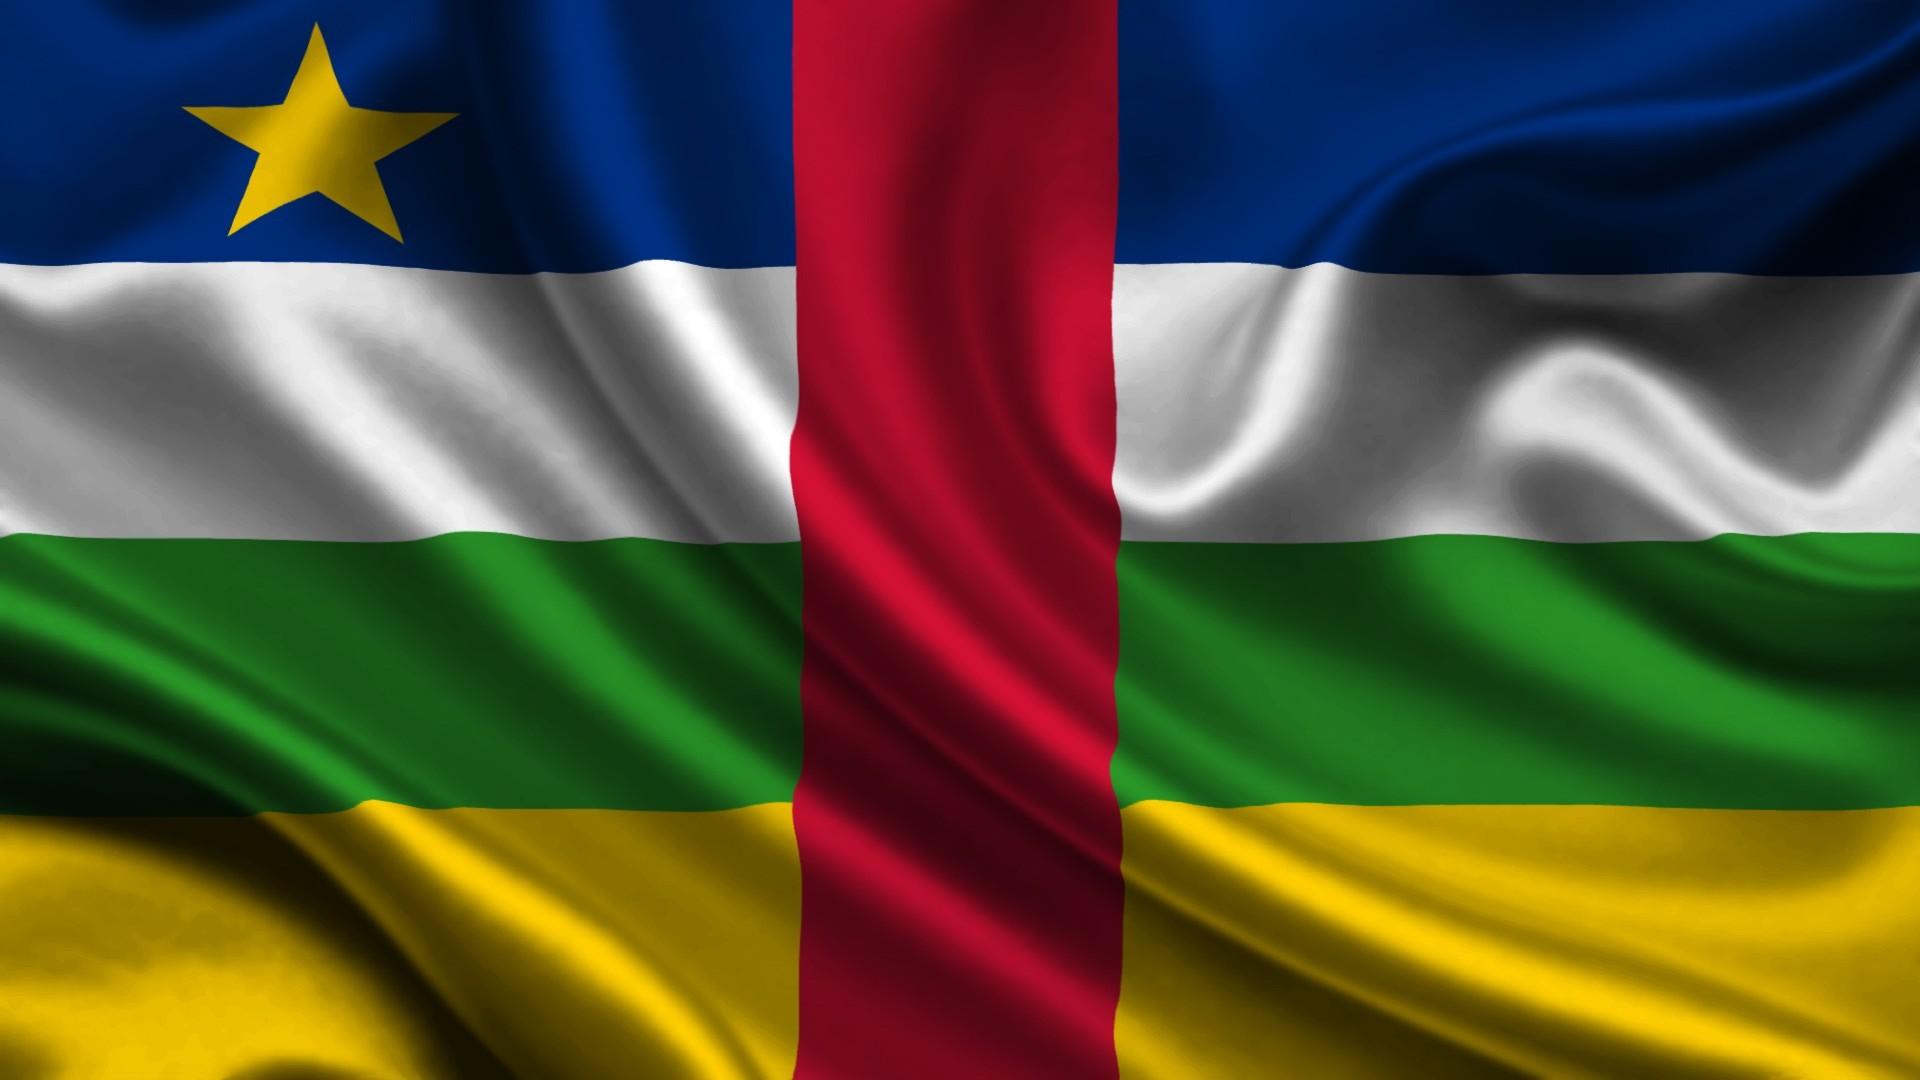 Central African Republic flag wallpaper